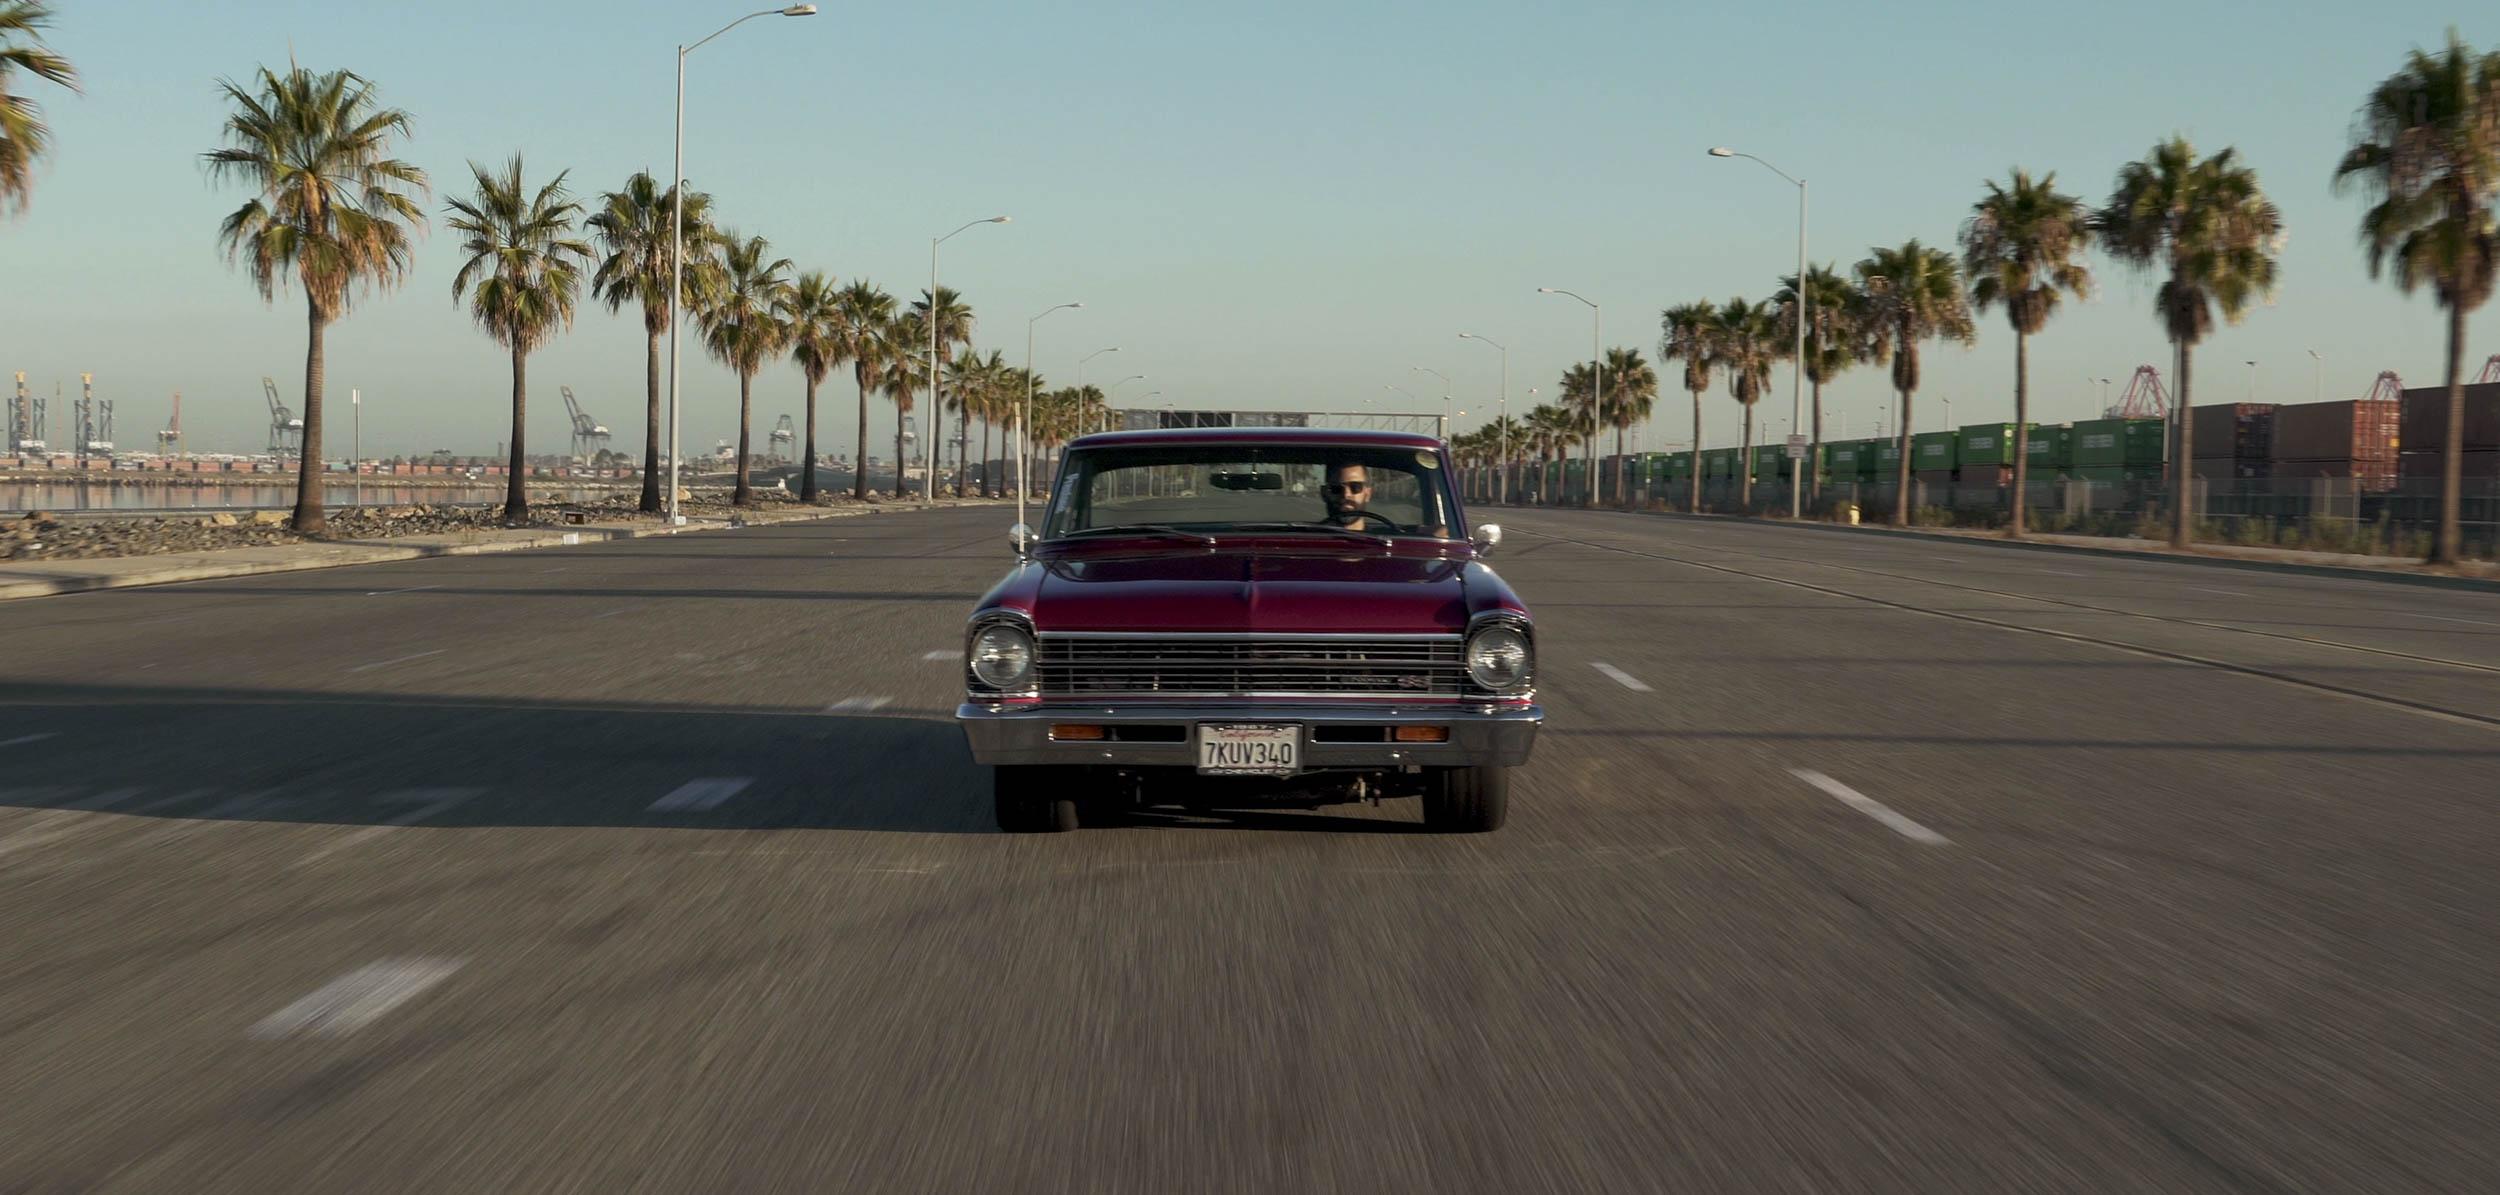 1967 Chevrolet Nova SS front